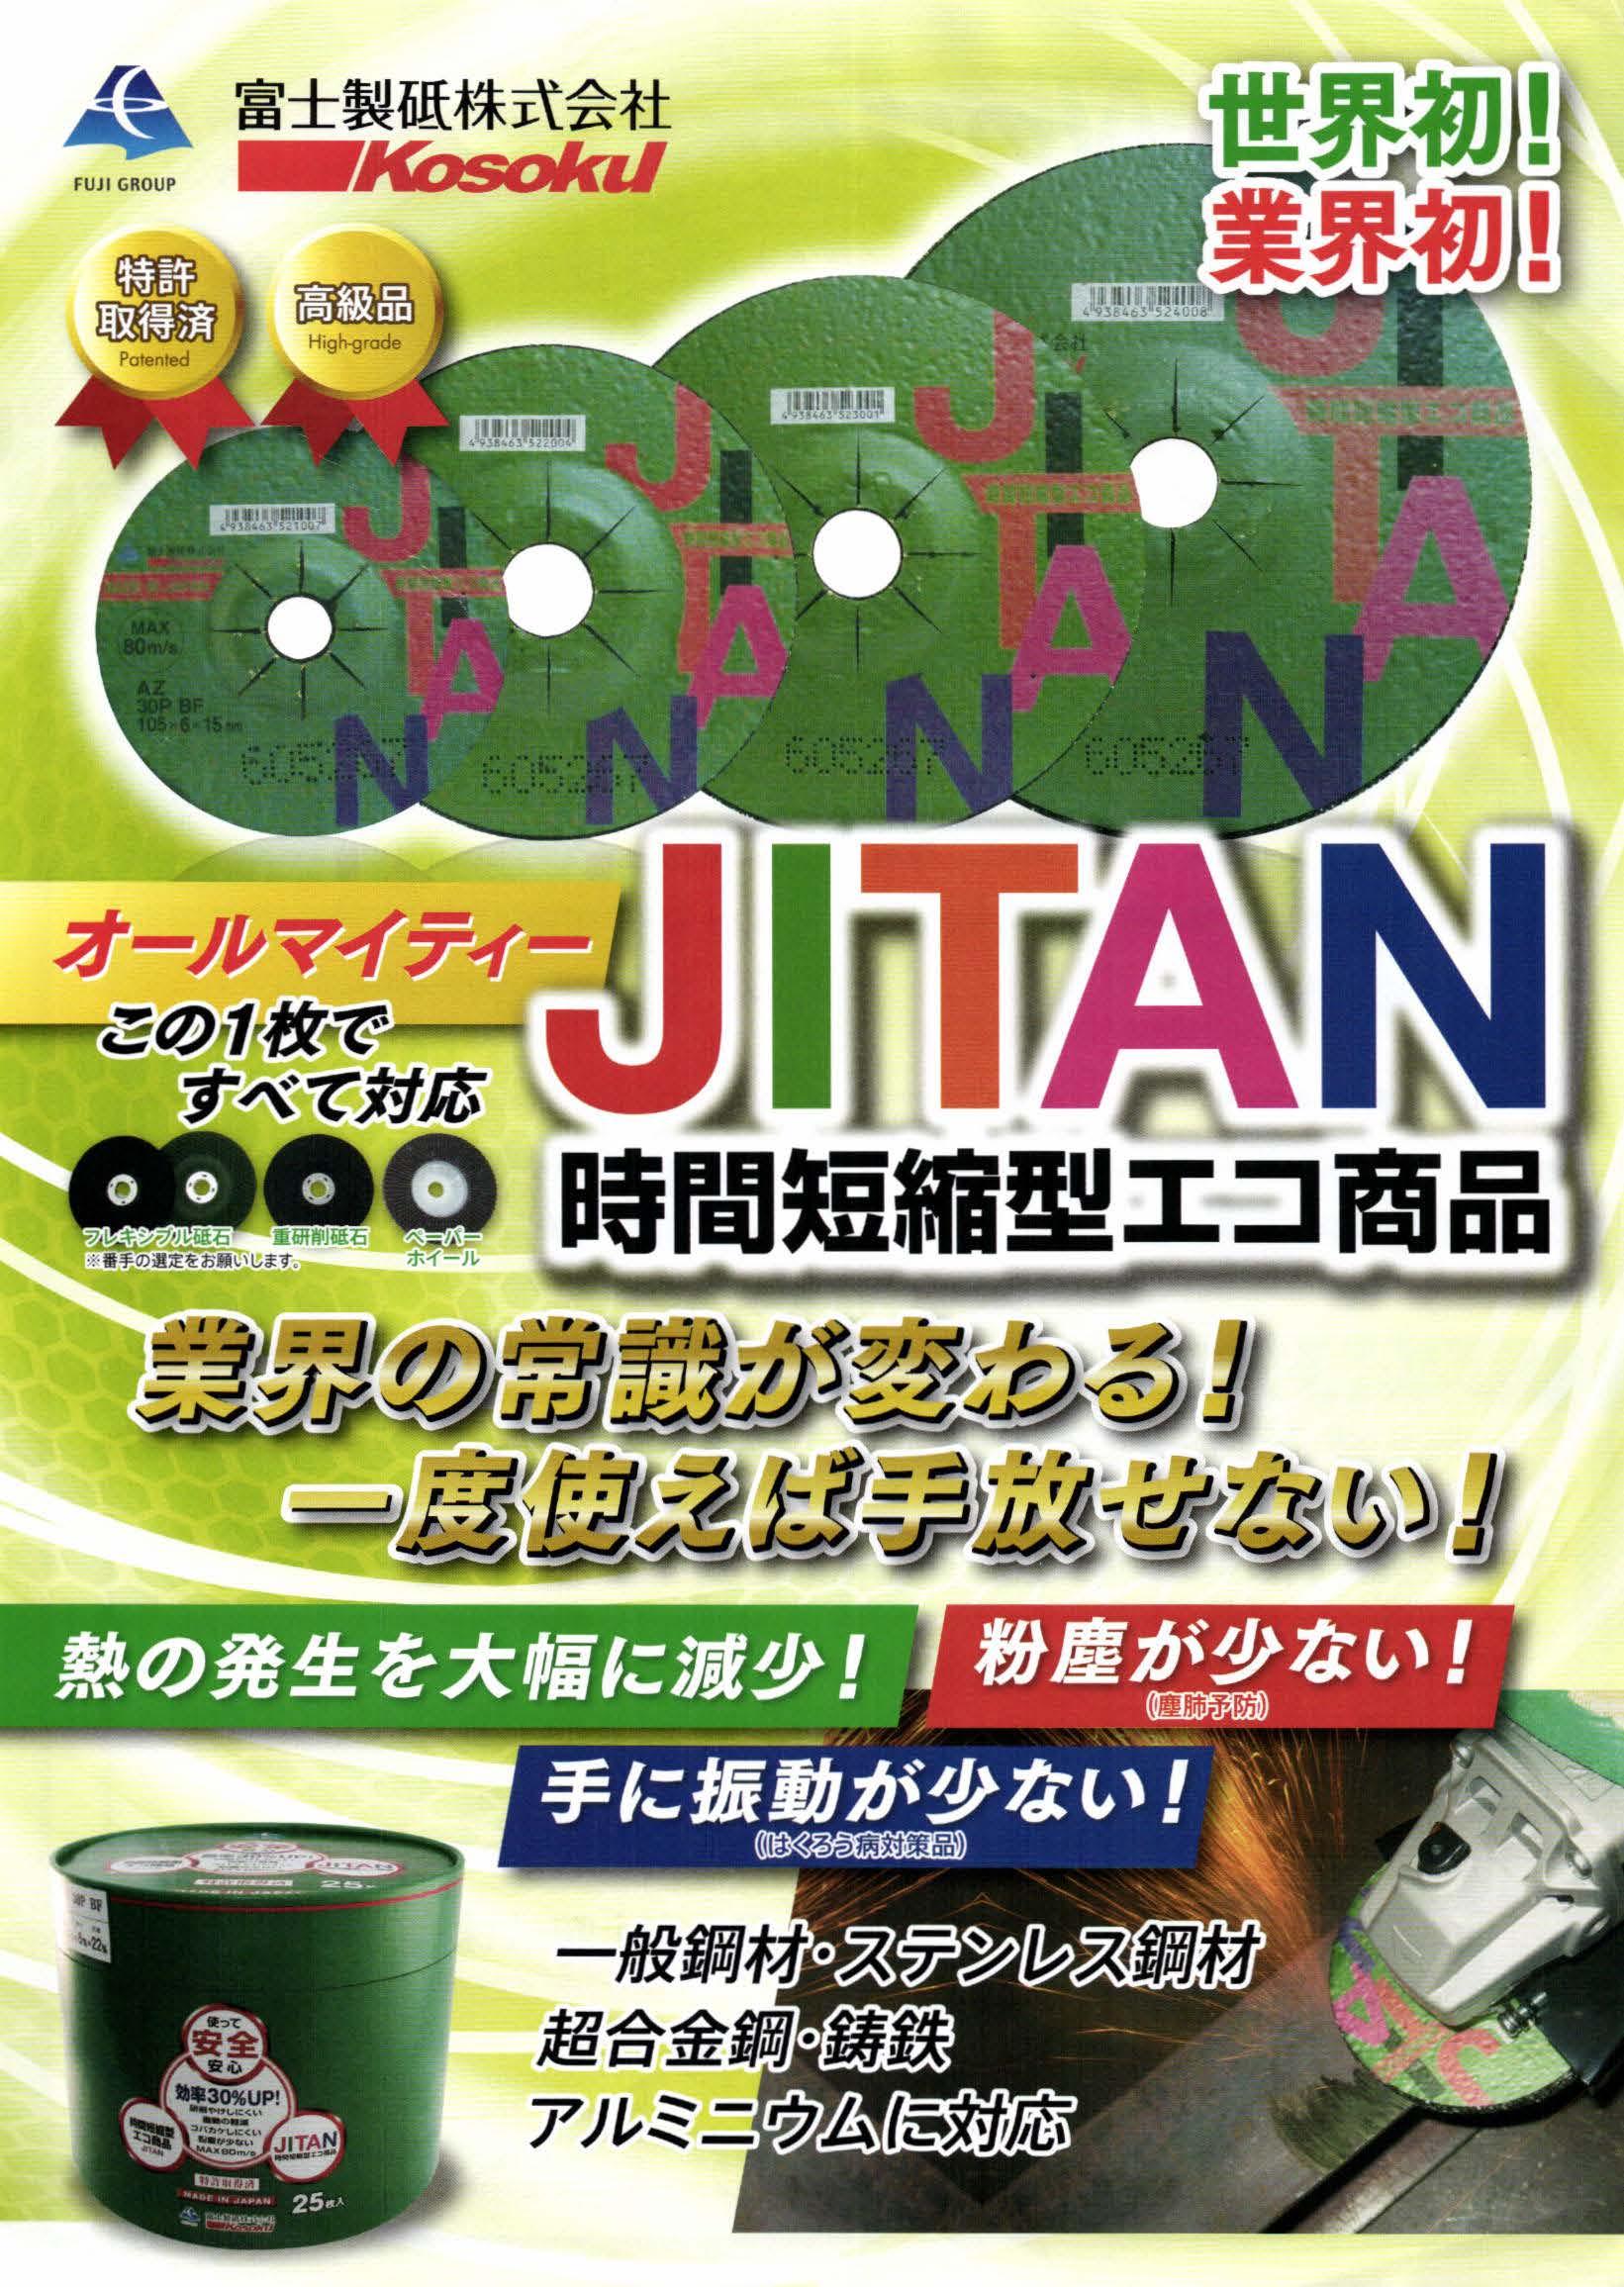 jitan_%e3%83%9a%e3%83%bc%e3%82%b8_1